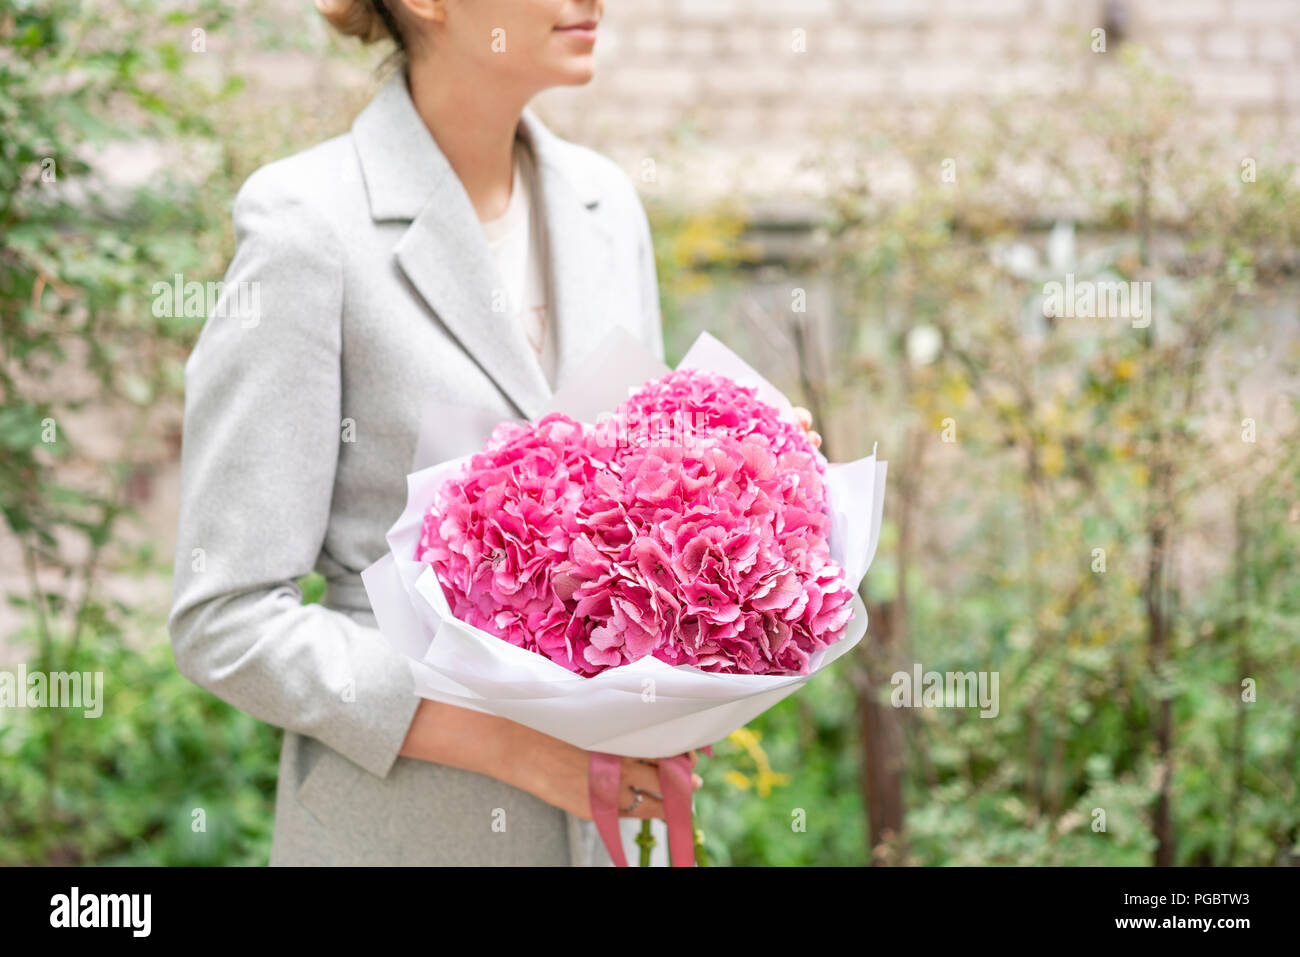 Rosa Hortensia Joven Sosteniendo Un Arreglo Floral Bouquet